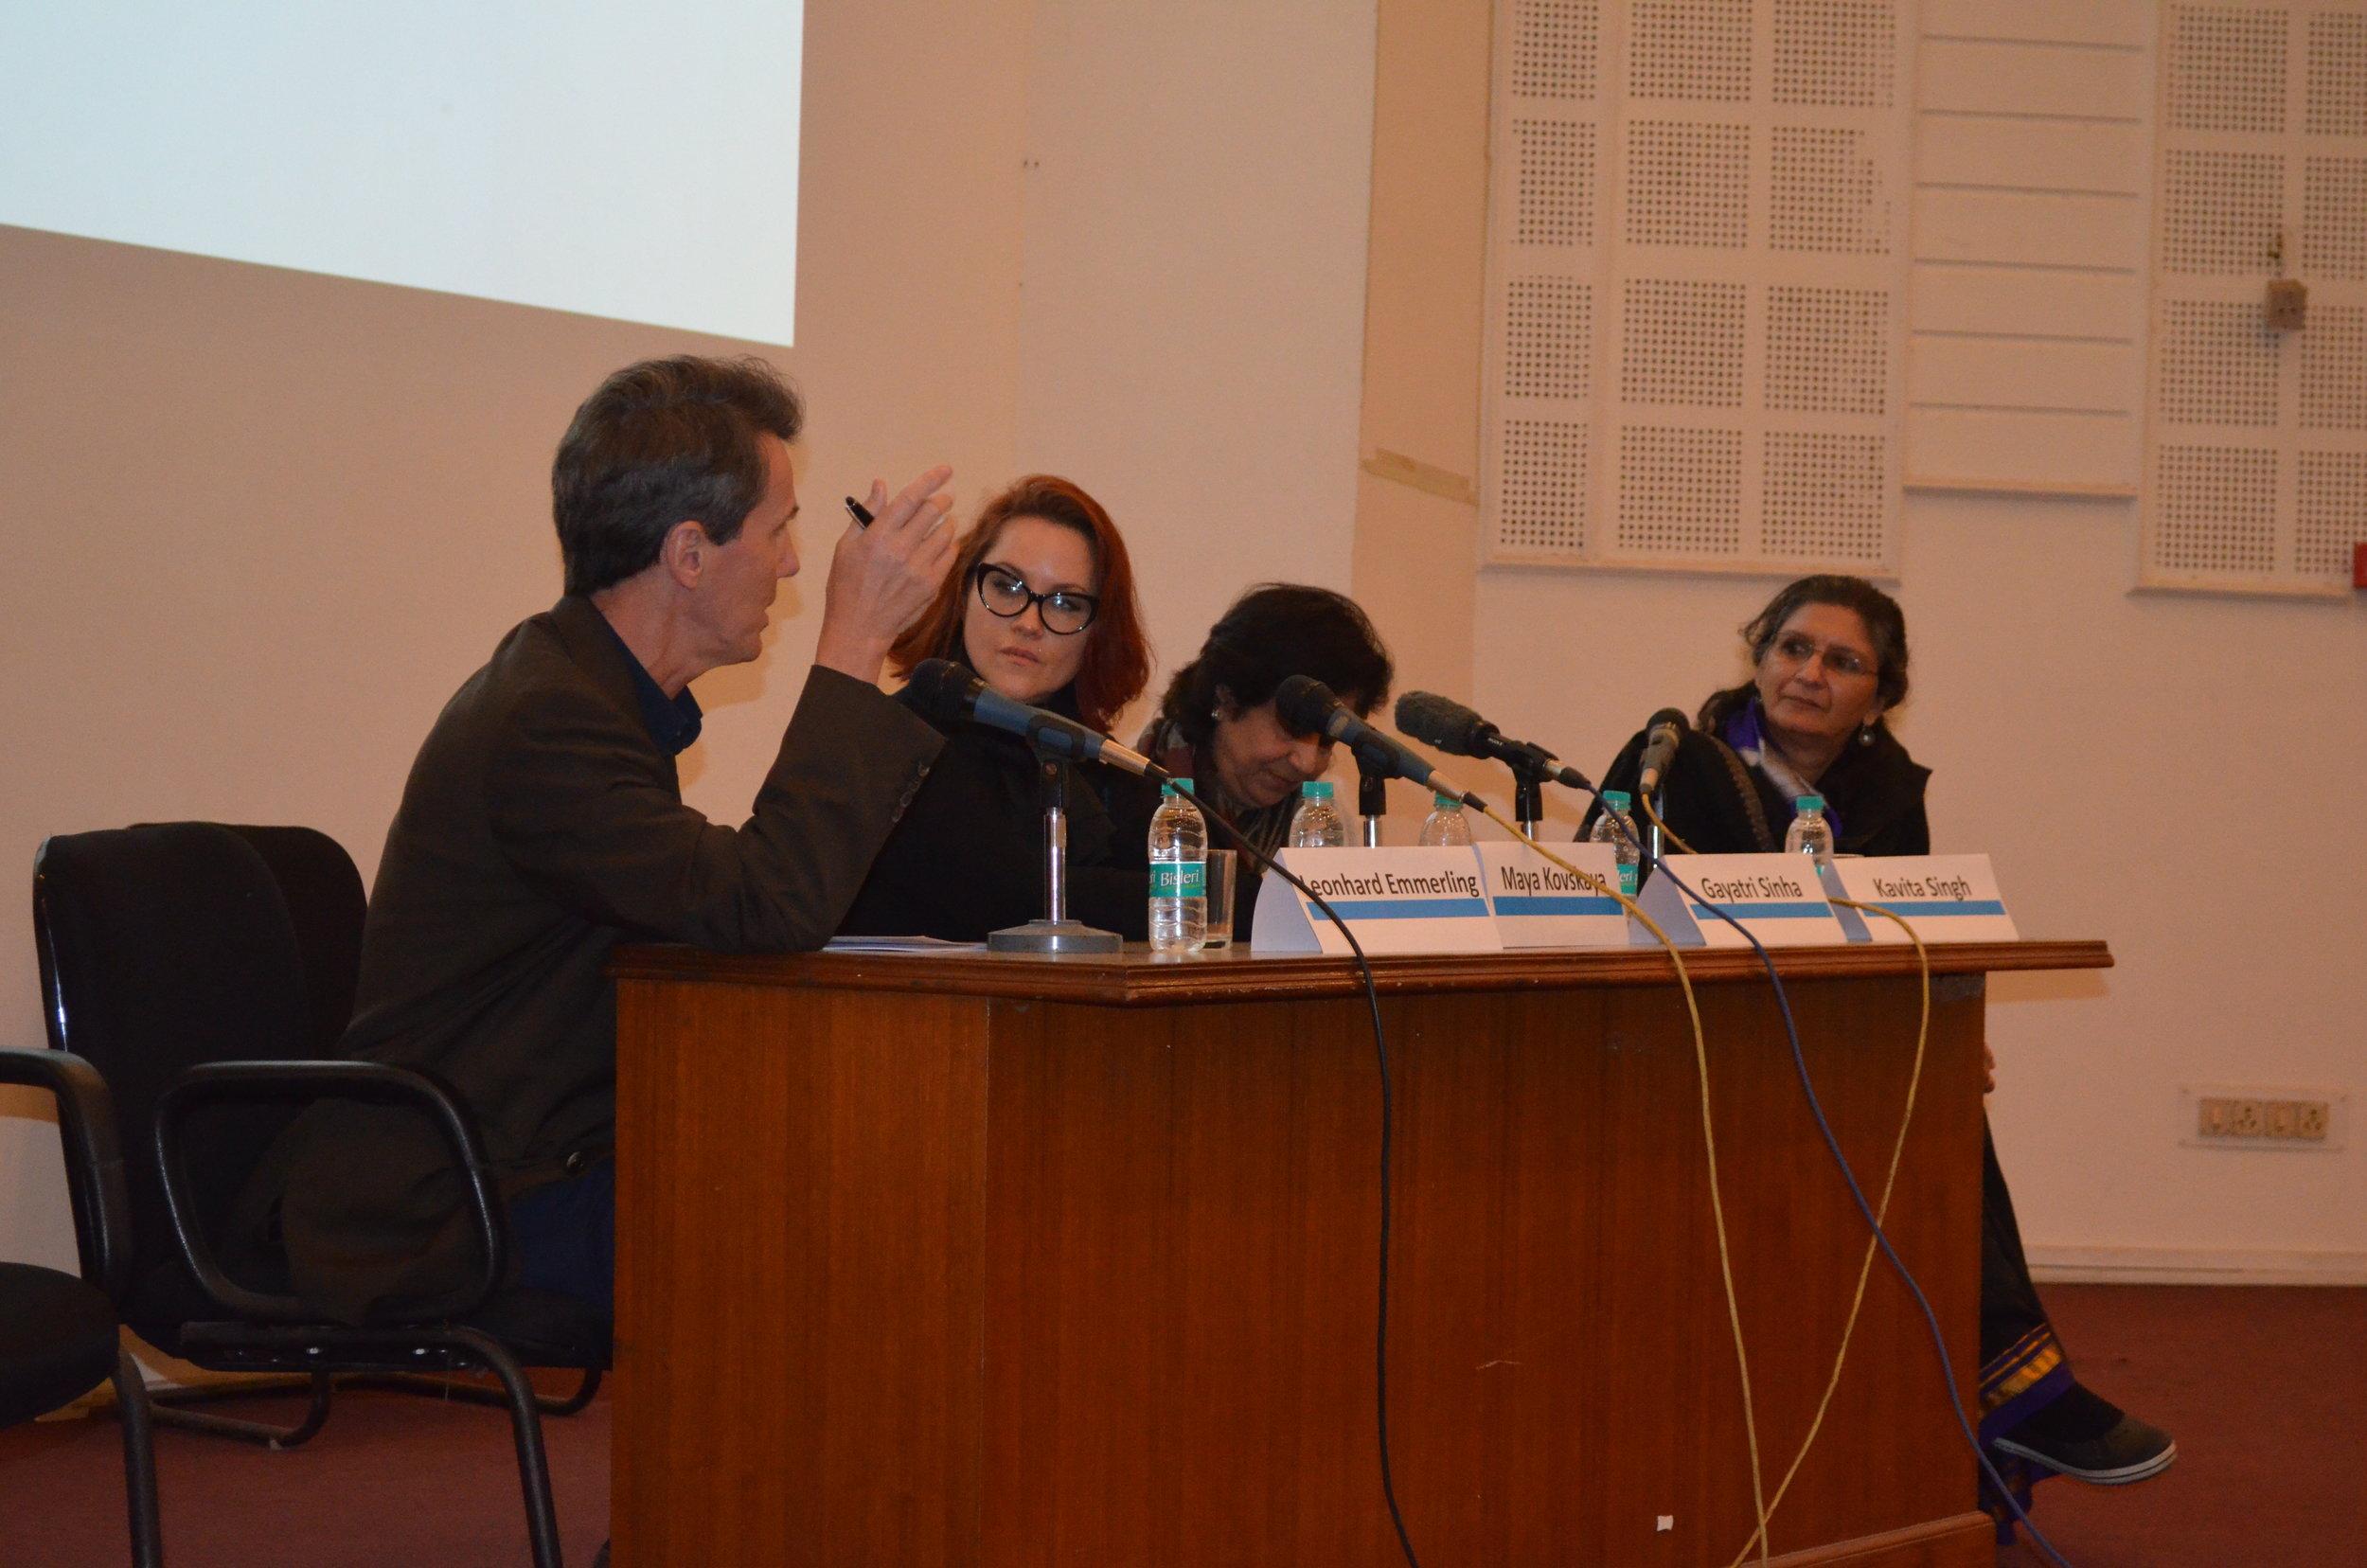 Curatorial Studies and Art Pedagogy with Gayatri Sinha,Leonhard Emmerling,Maya Kovskaya and Kavita Singh.